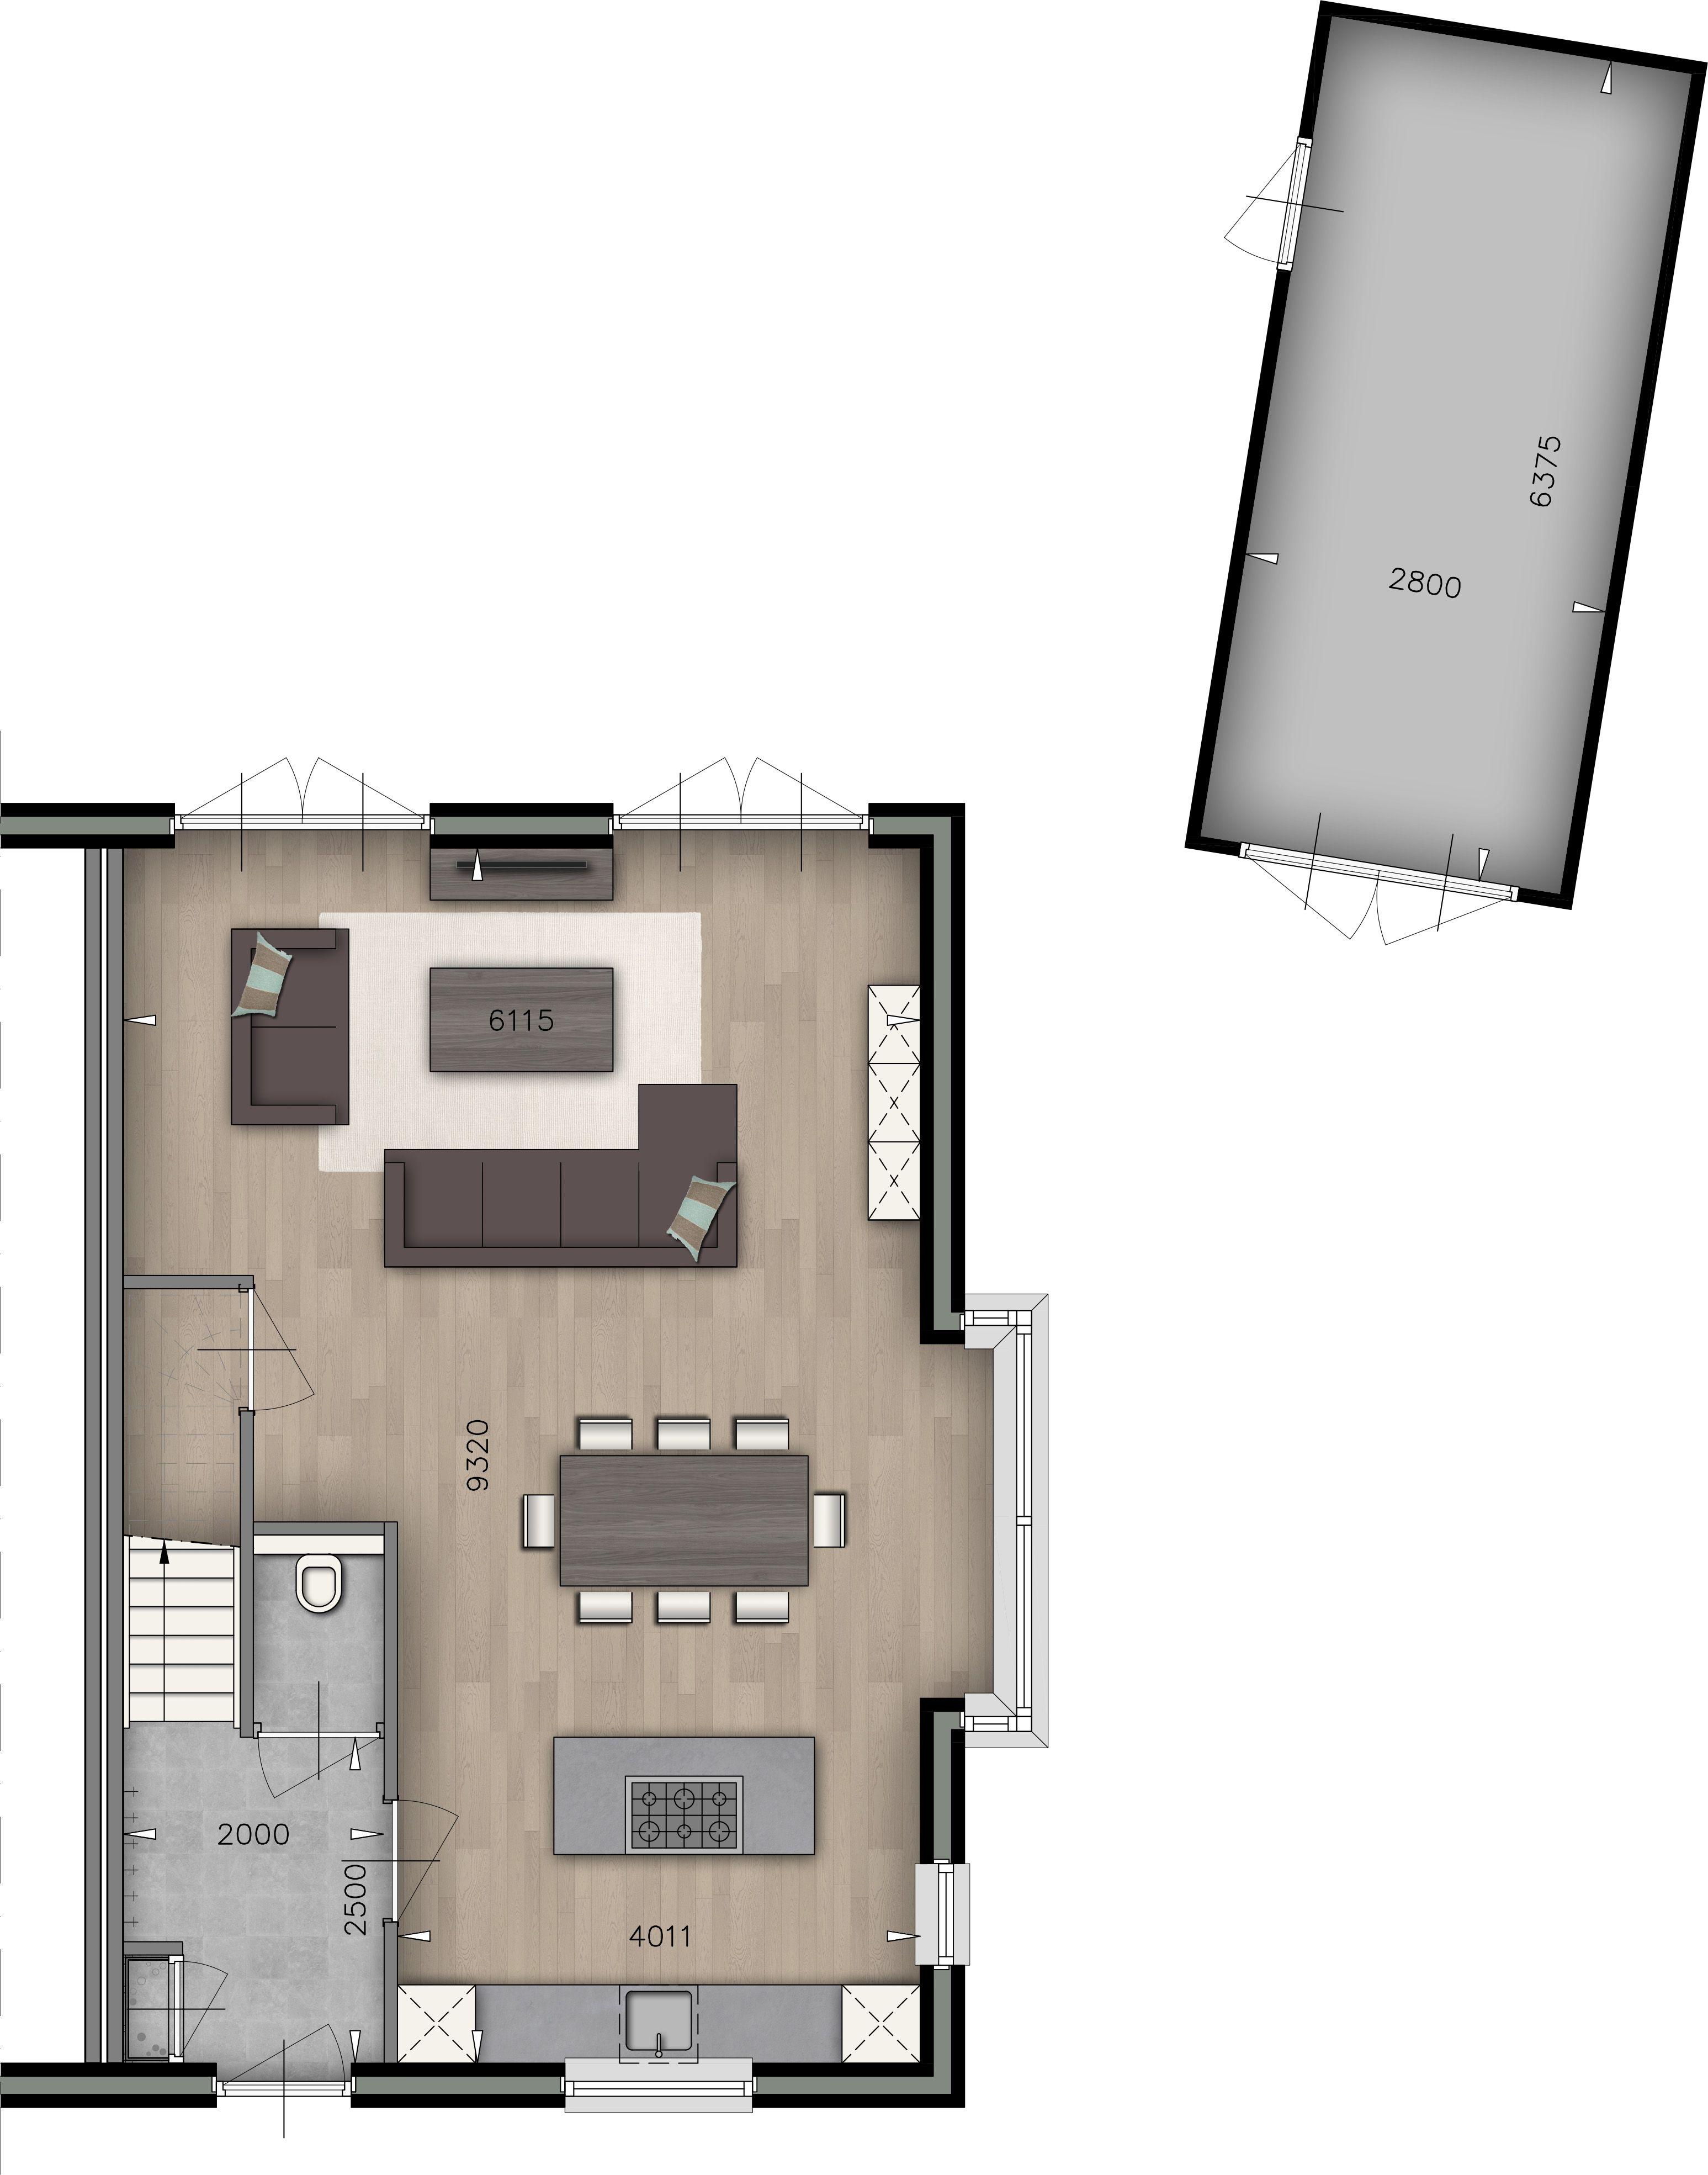 Plattegrond Woonkamer | Keuken | WC | Garage - indeling kamer ...